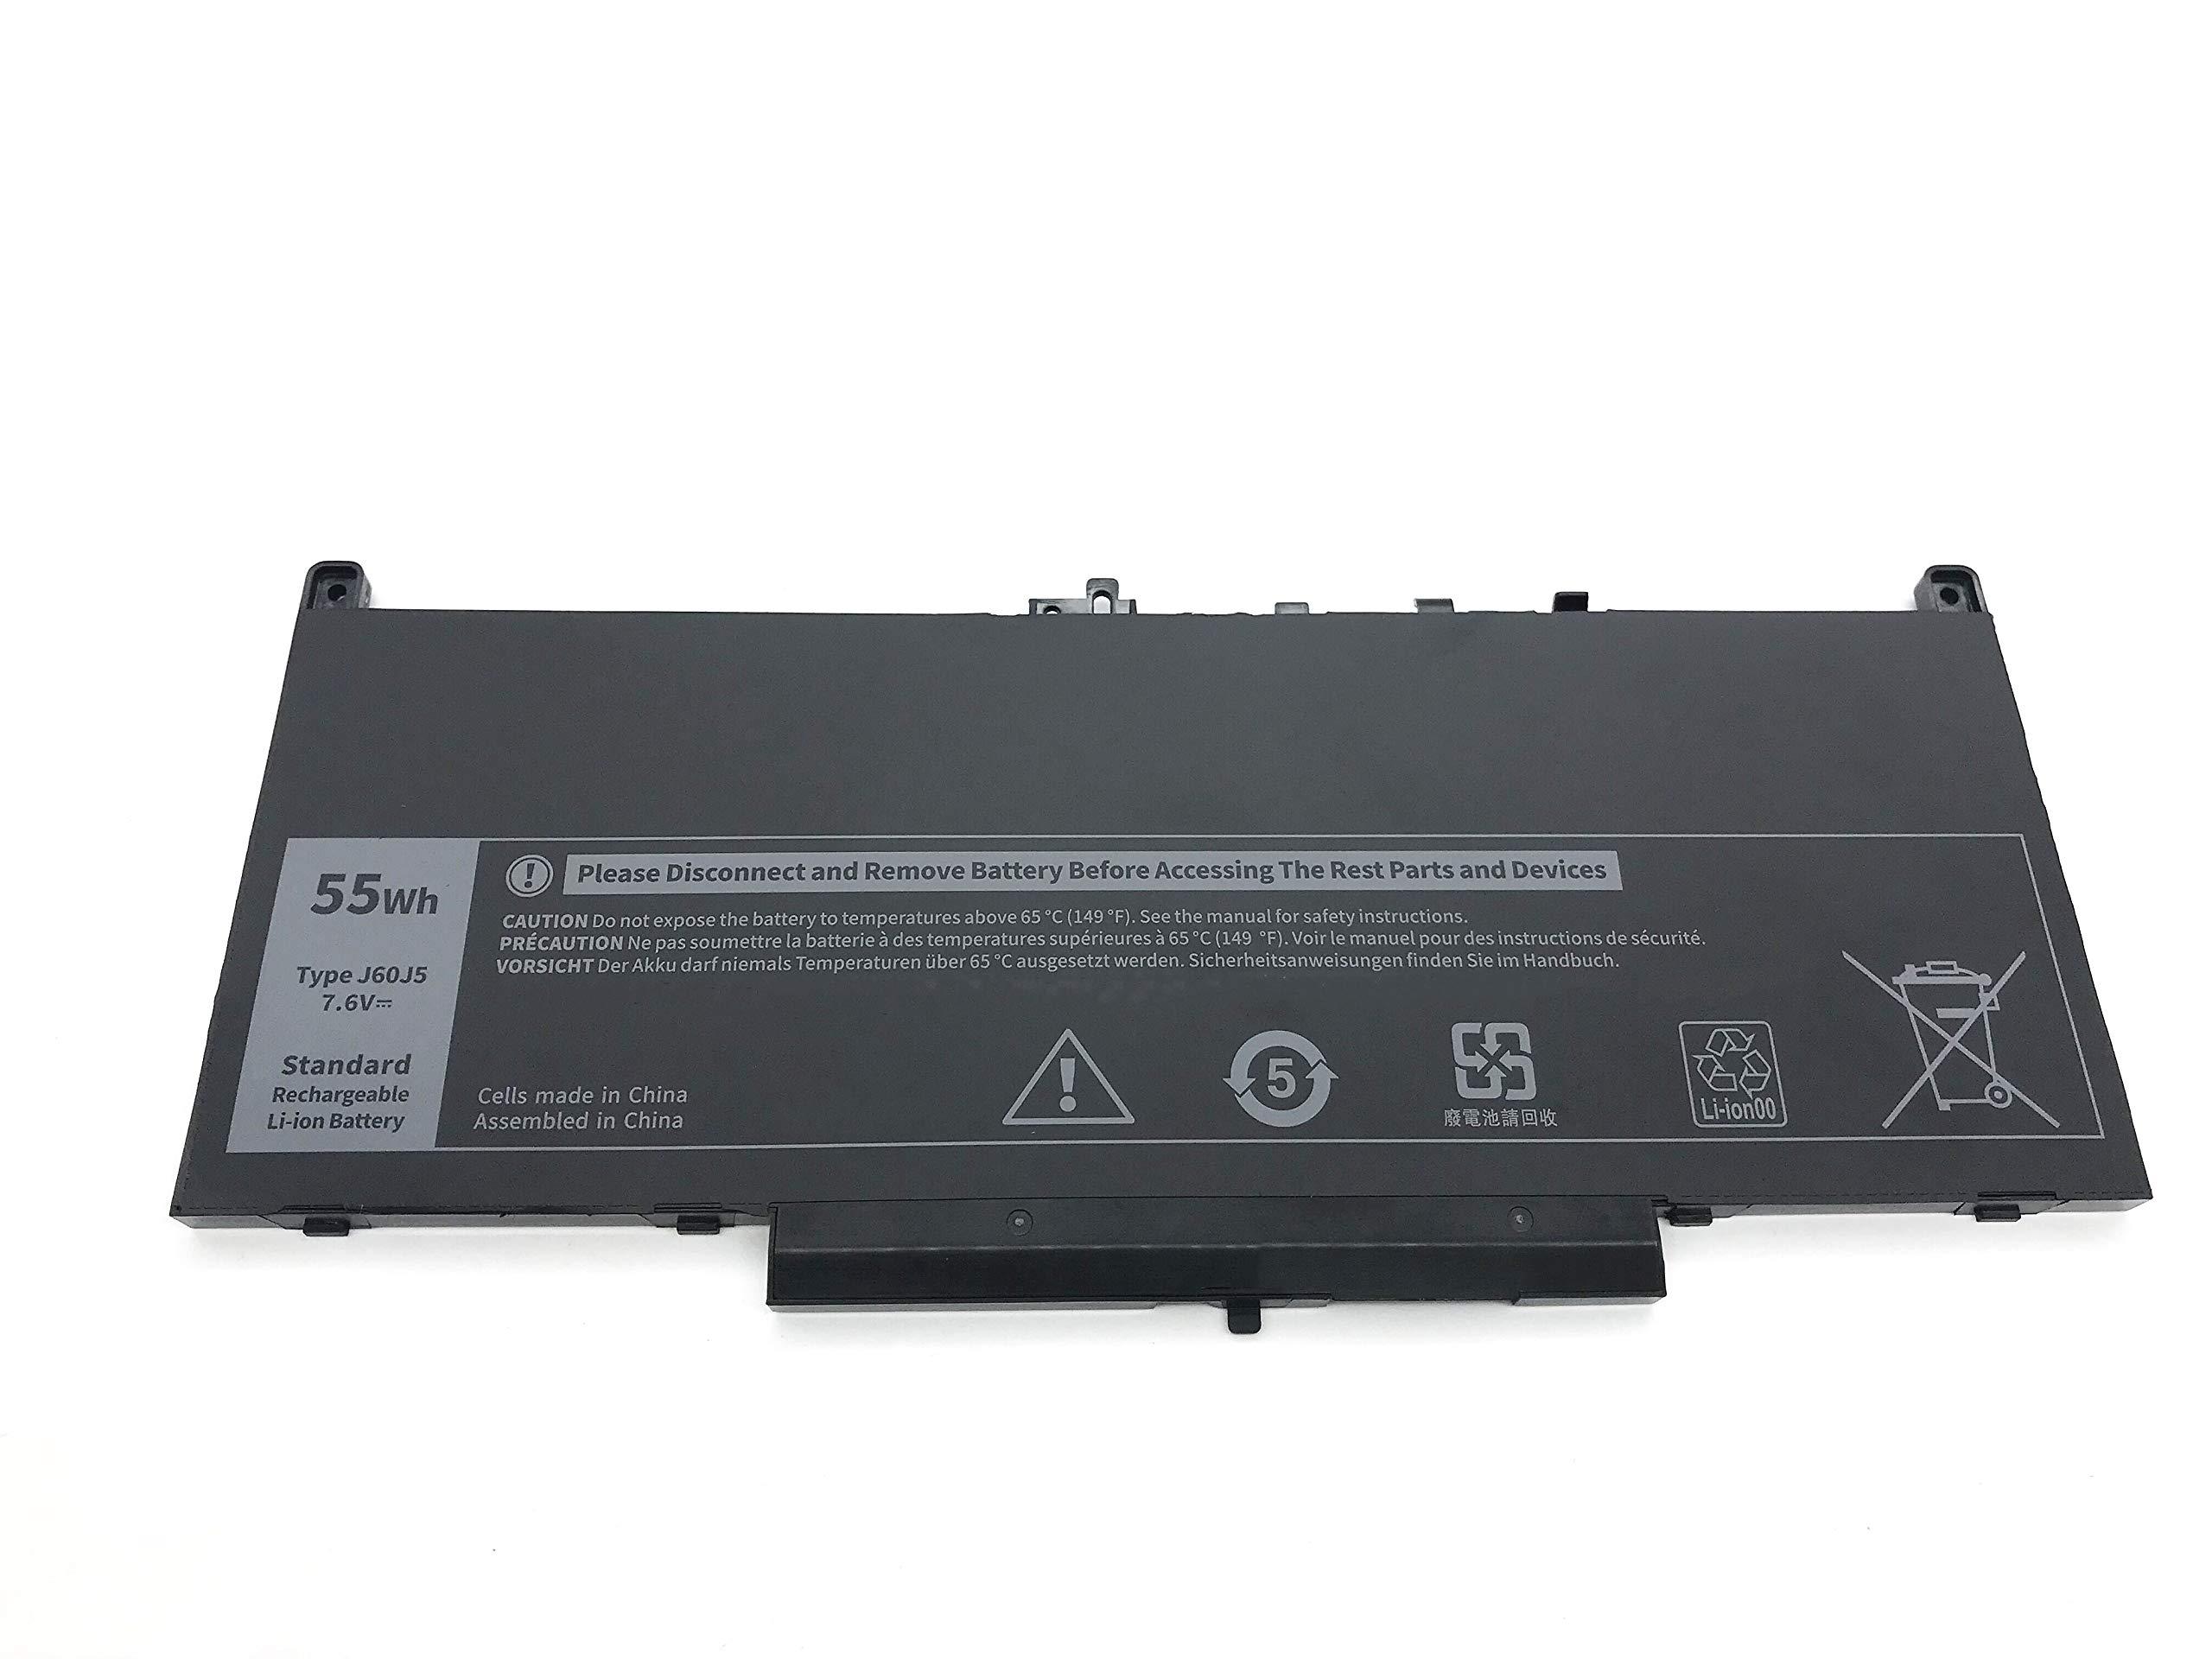 Bateria J60J5 7.6V 55Wh Dell Latitude E7270 E7470 Ser (YFVD)